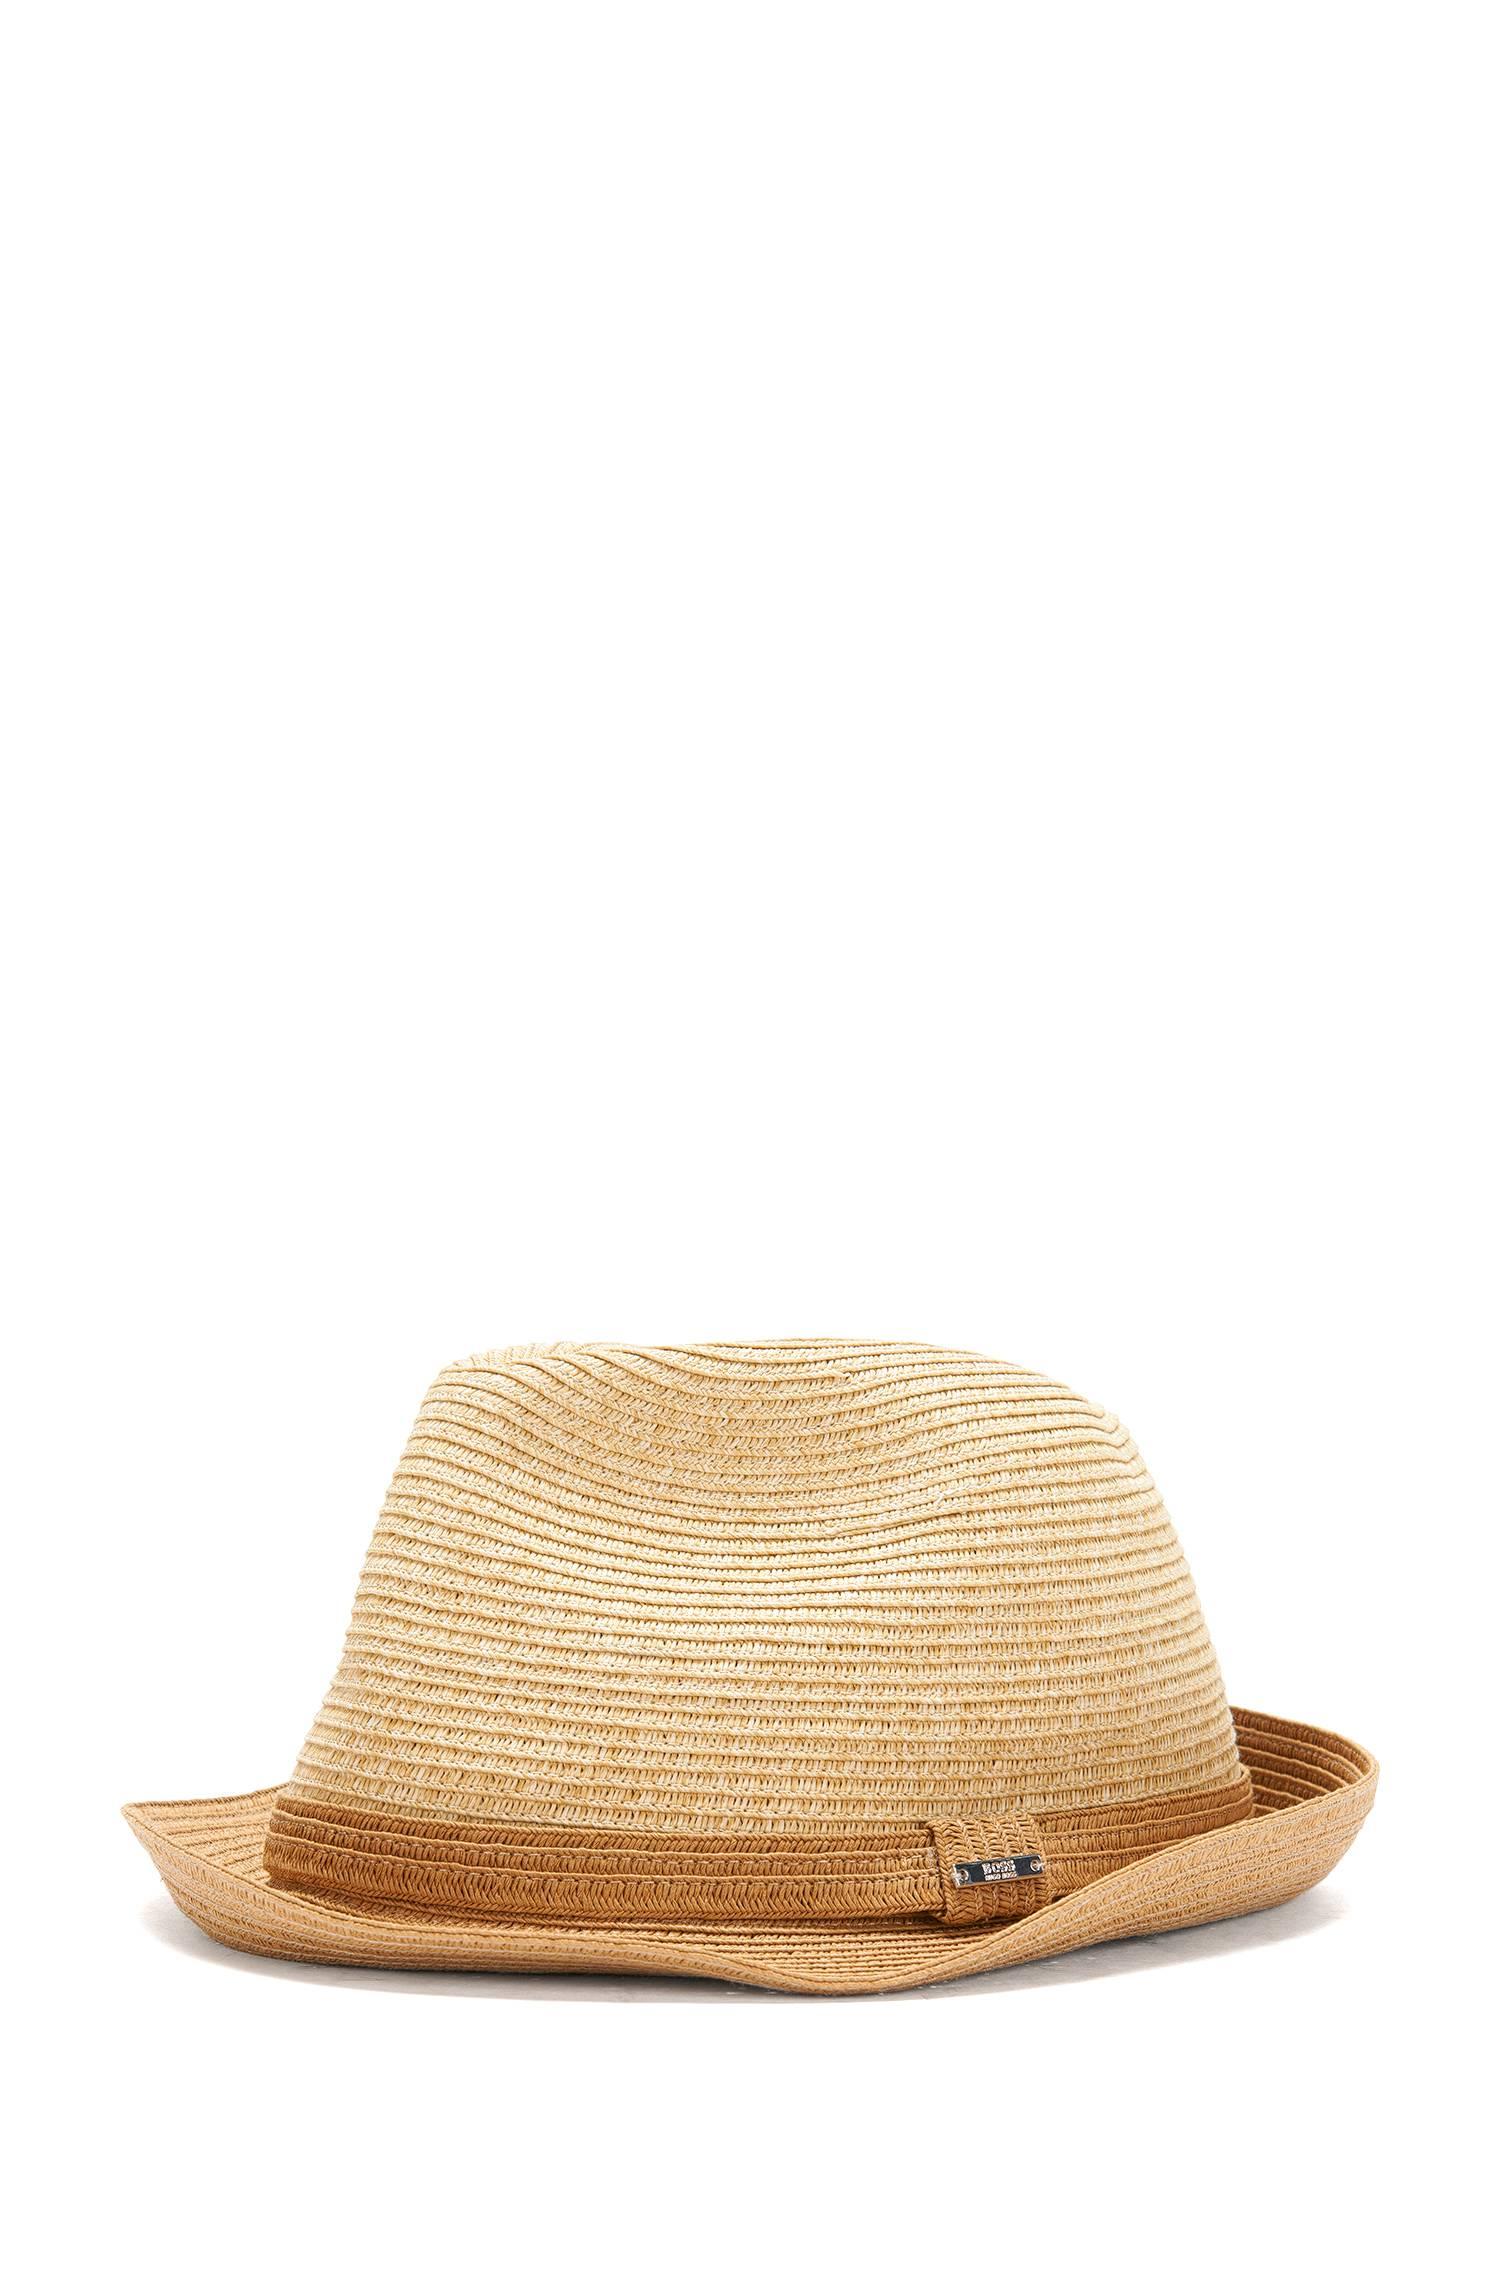 Trilby hat in 2tone design `Fellio`